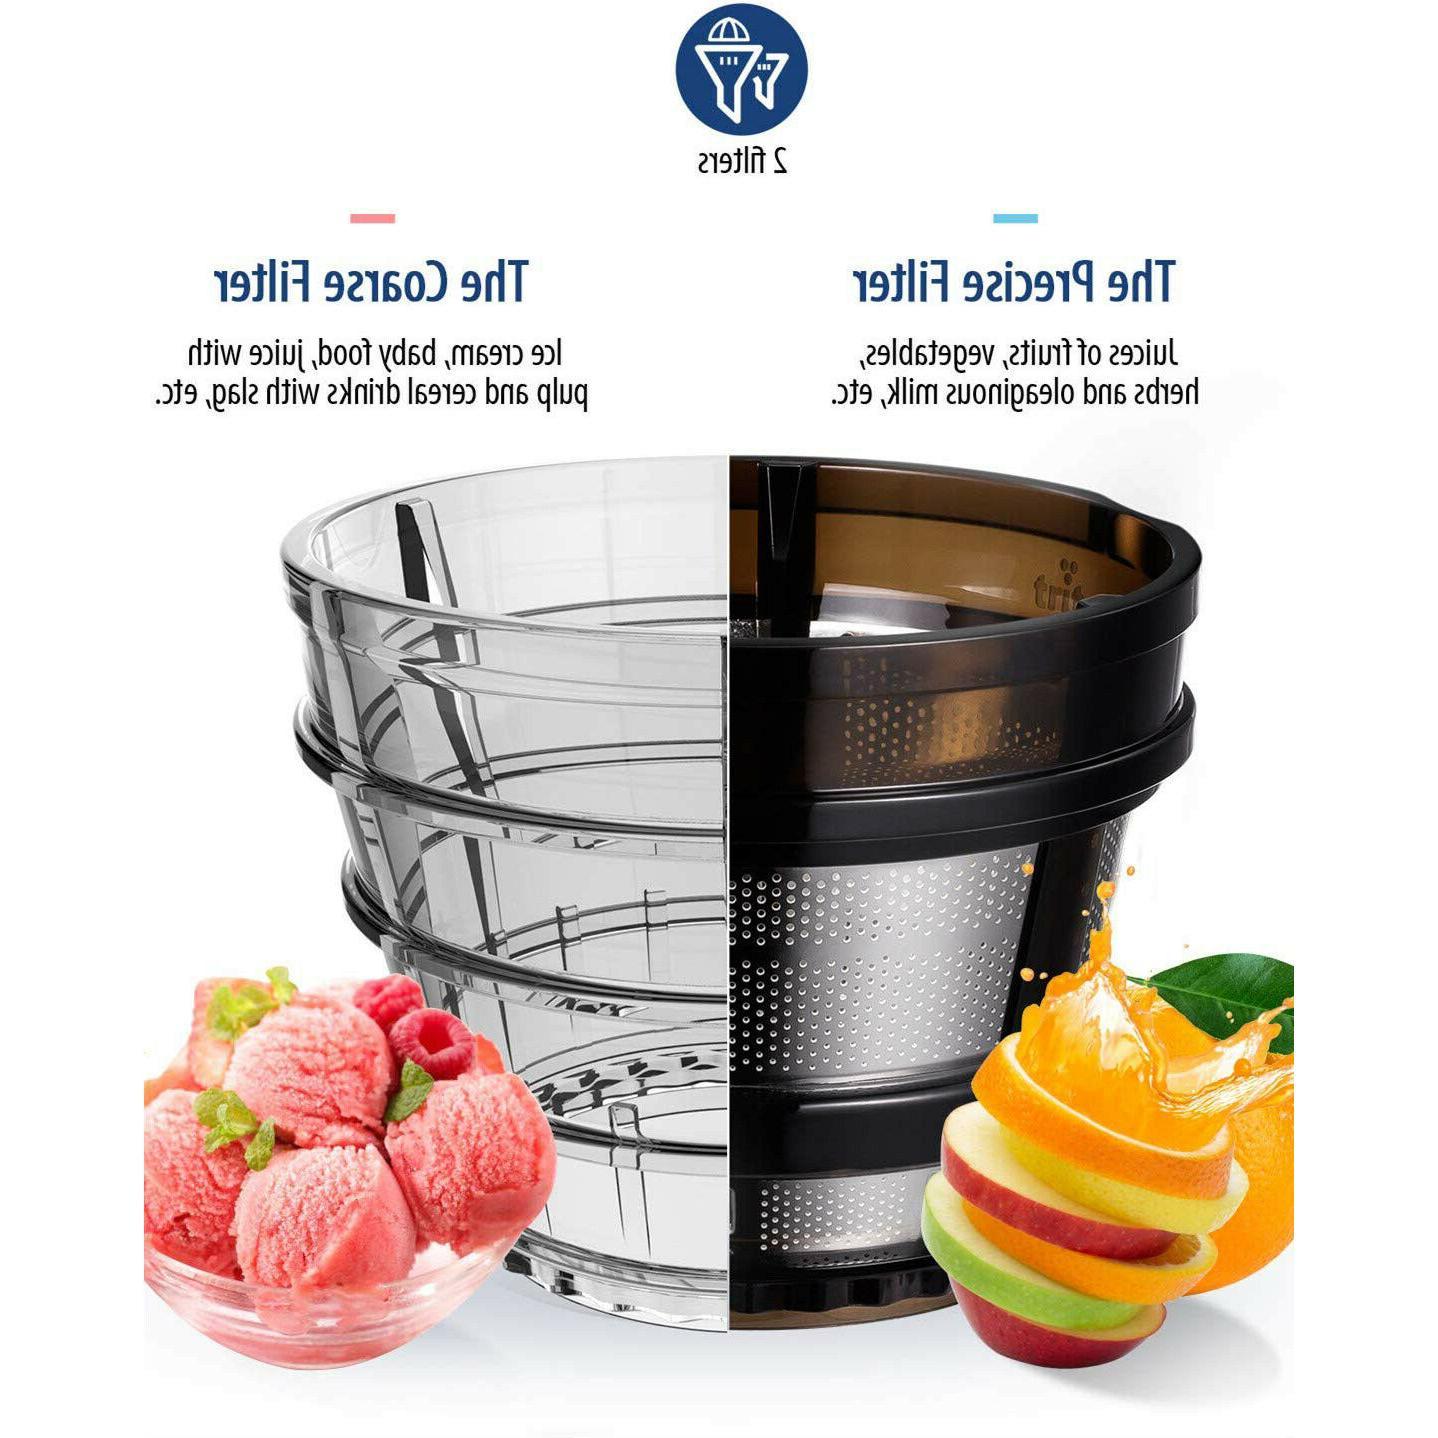 COMFEE' BPA Juicer Extractor Ice Cream Mint